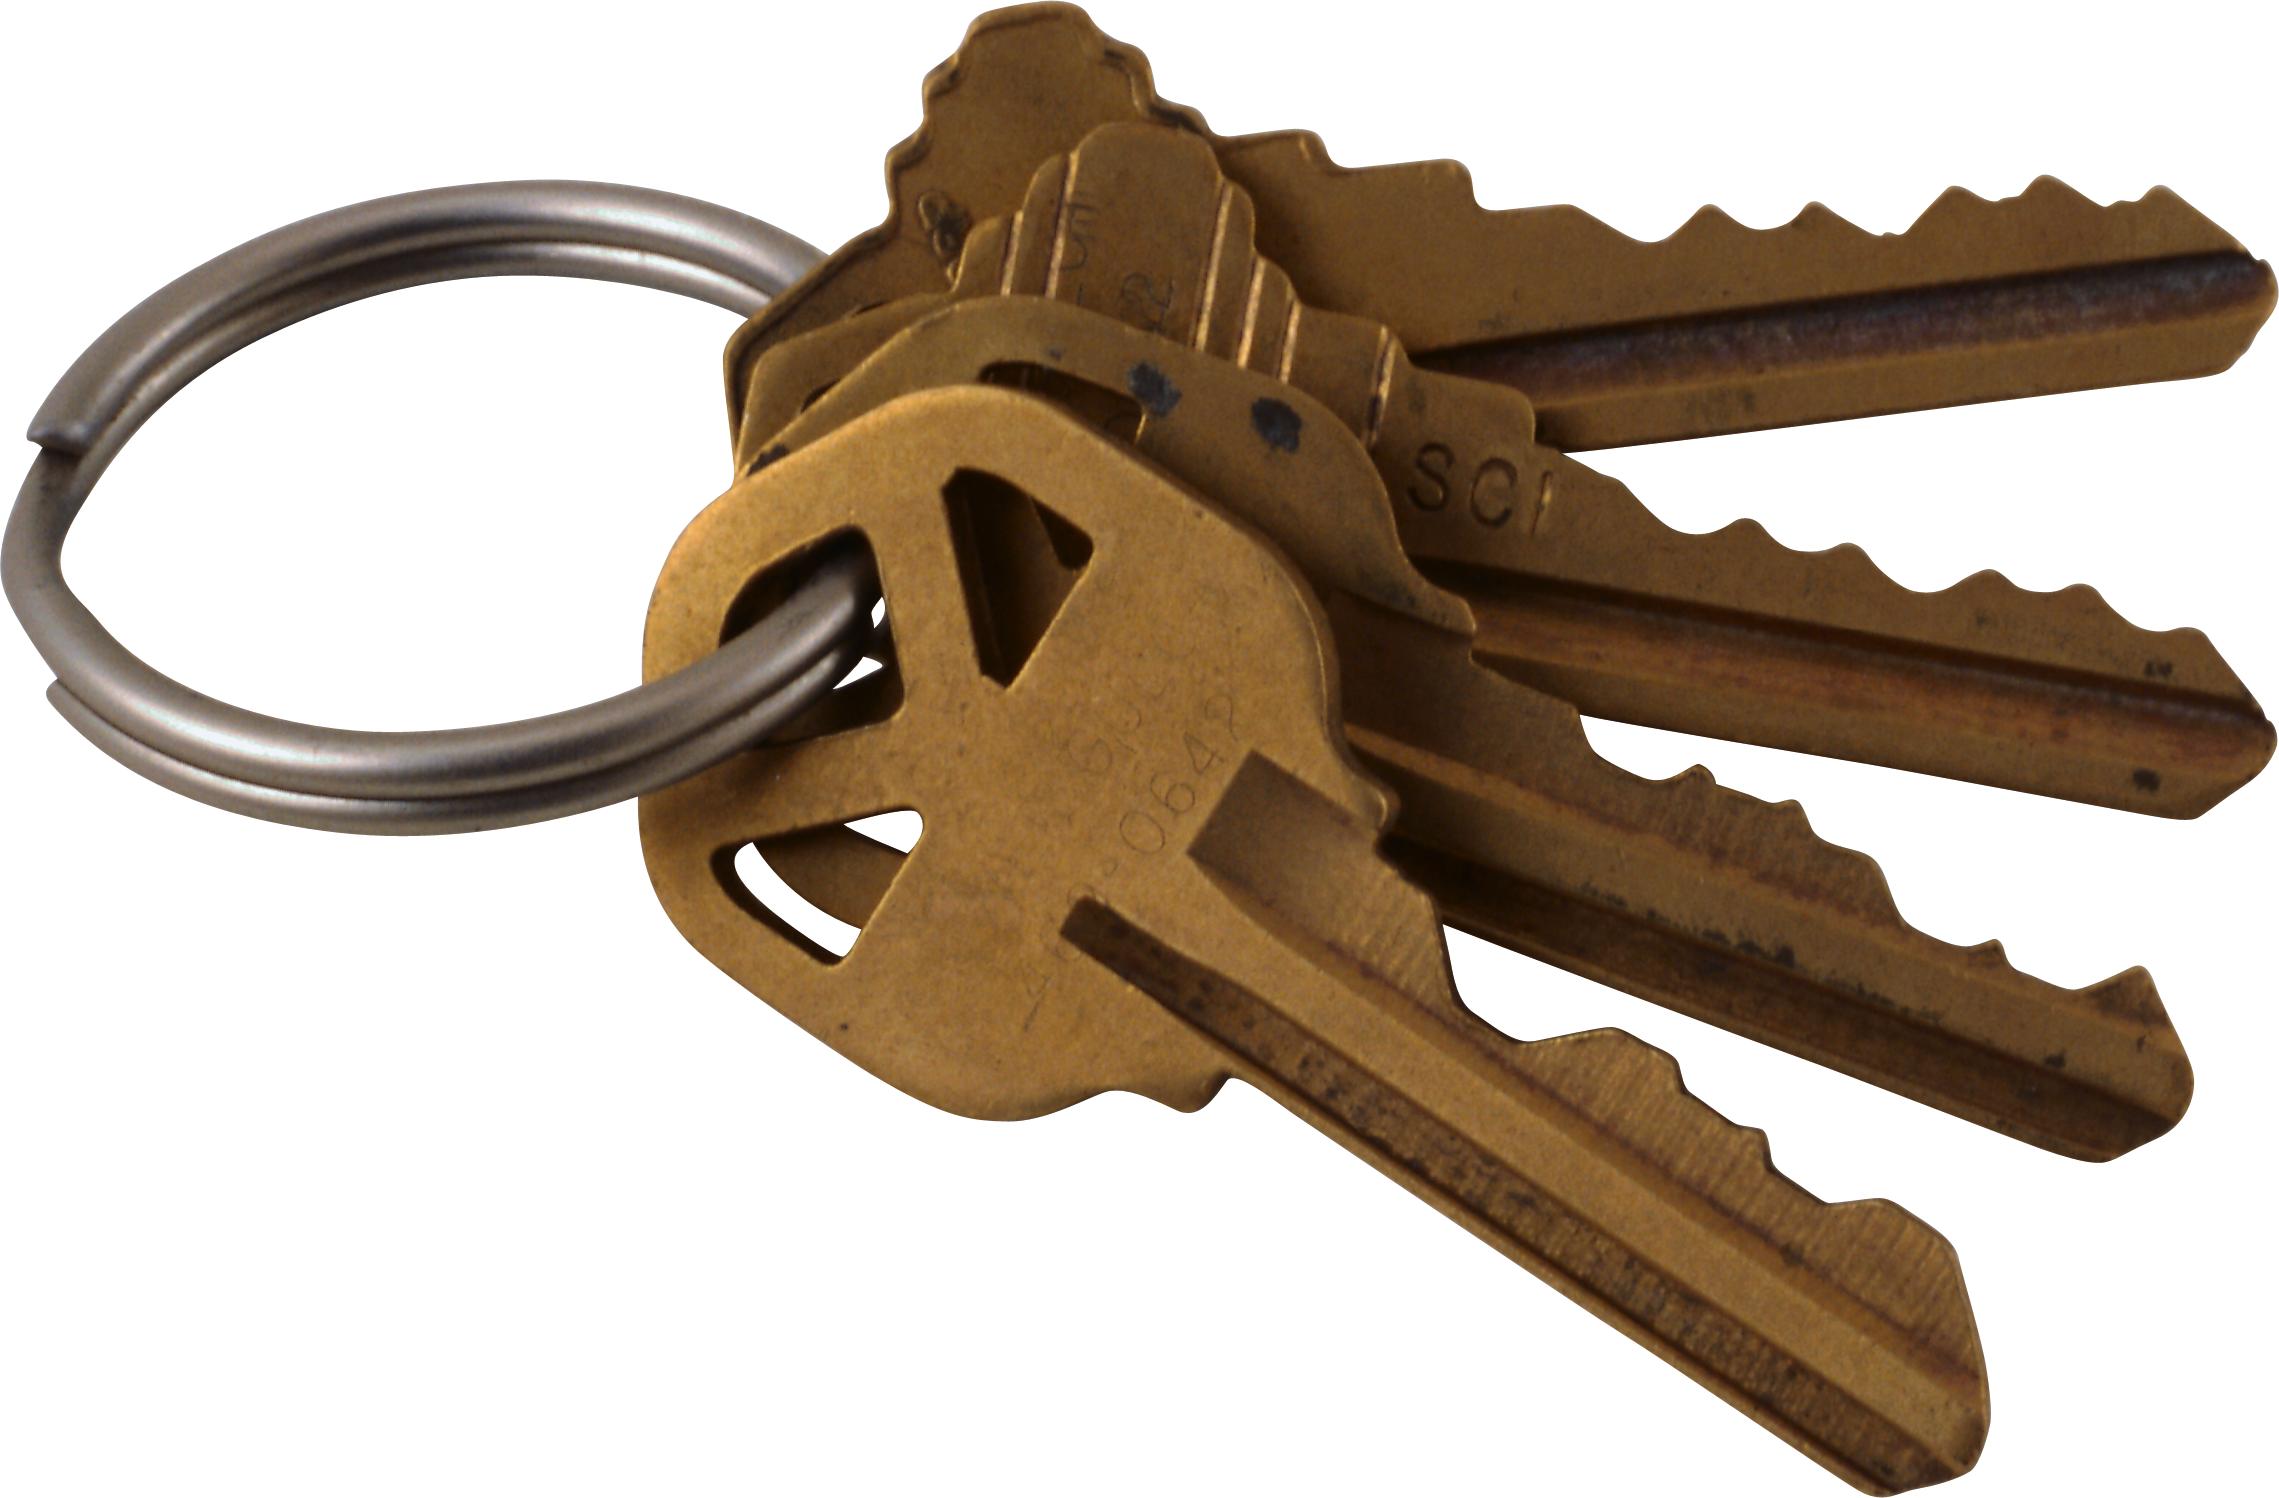 Key S Png Image Image Key Key Png Images